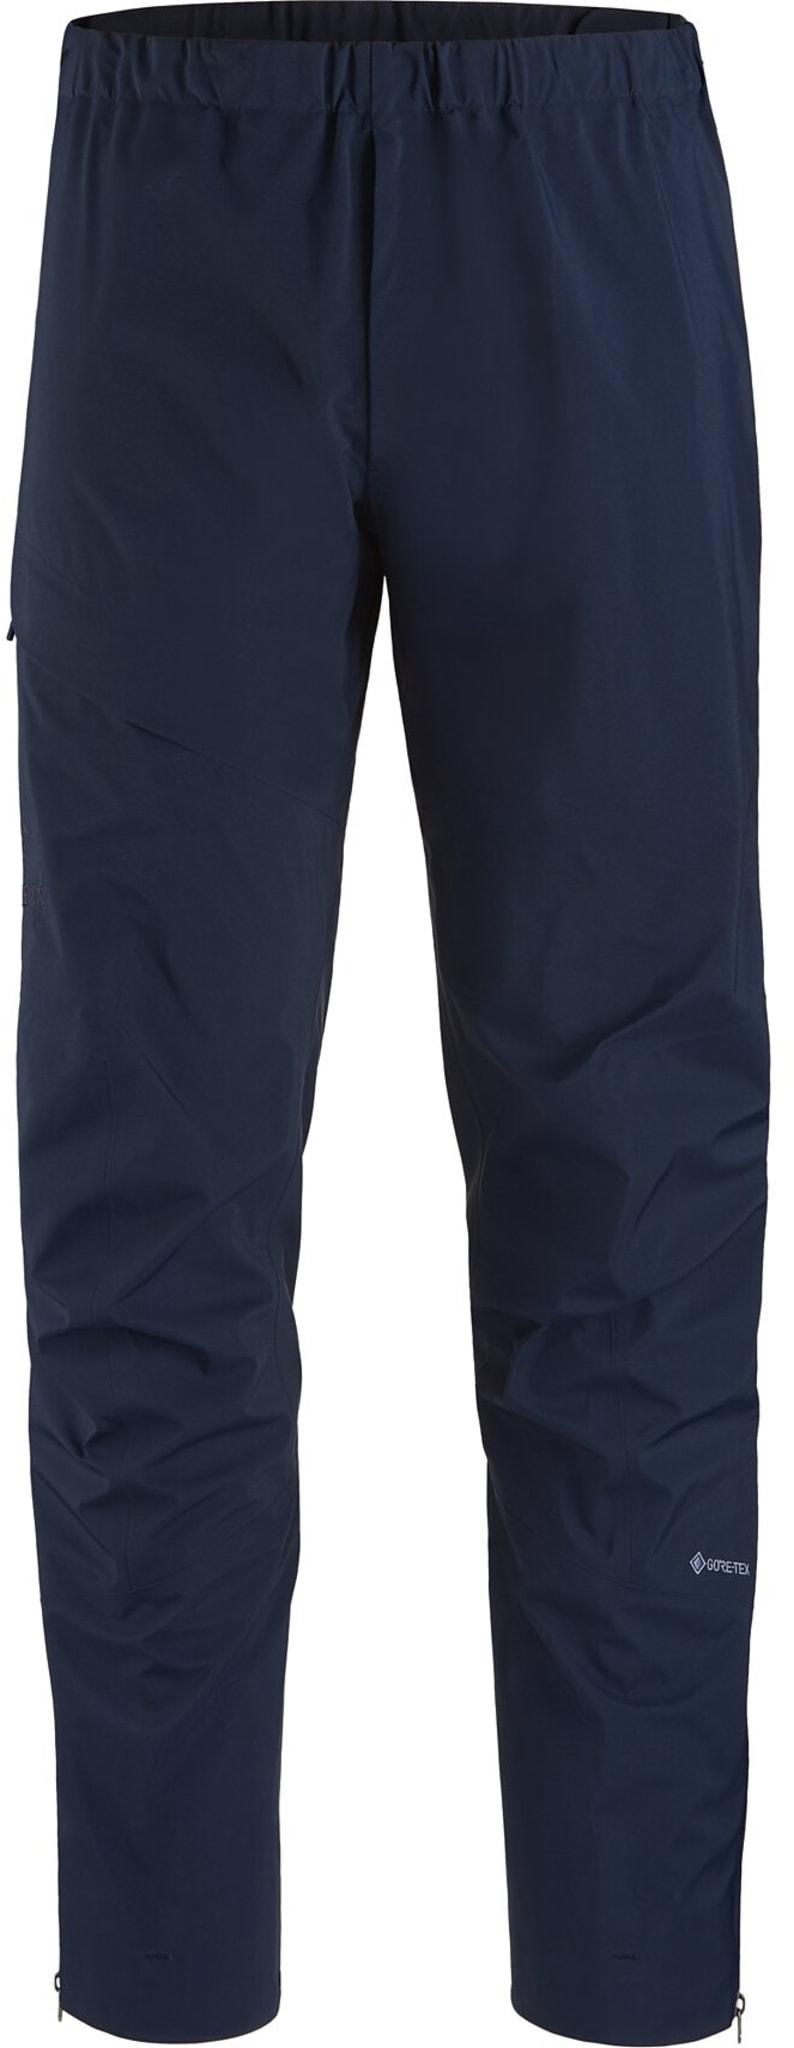 Allsidig GORE-TEX-bukse